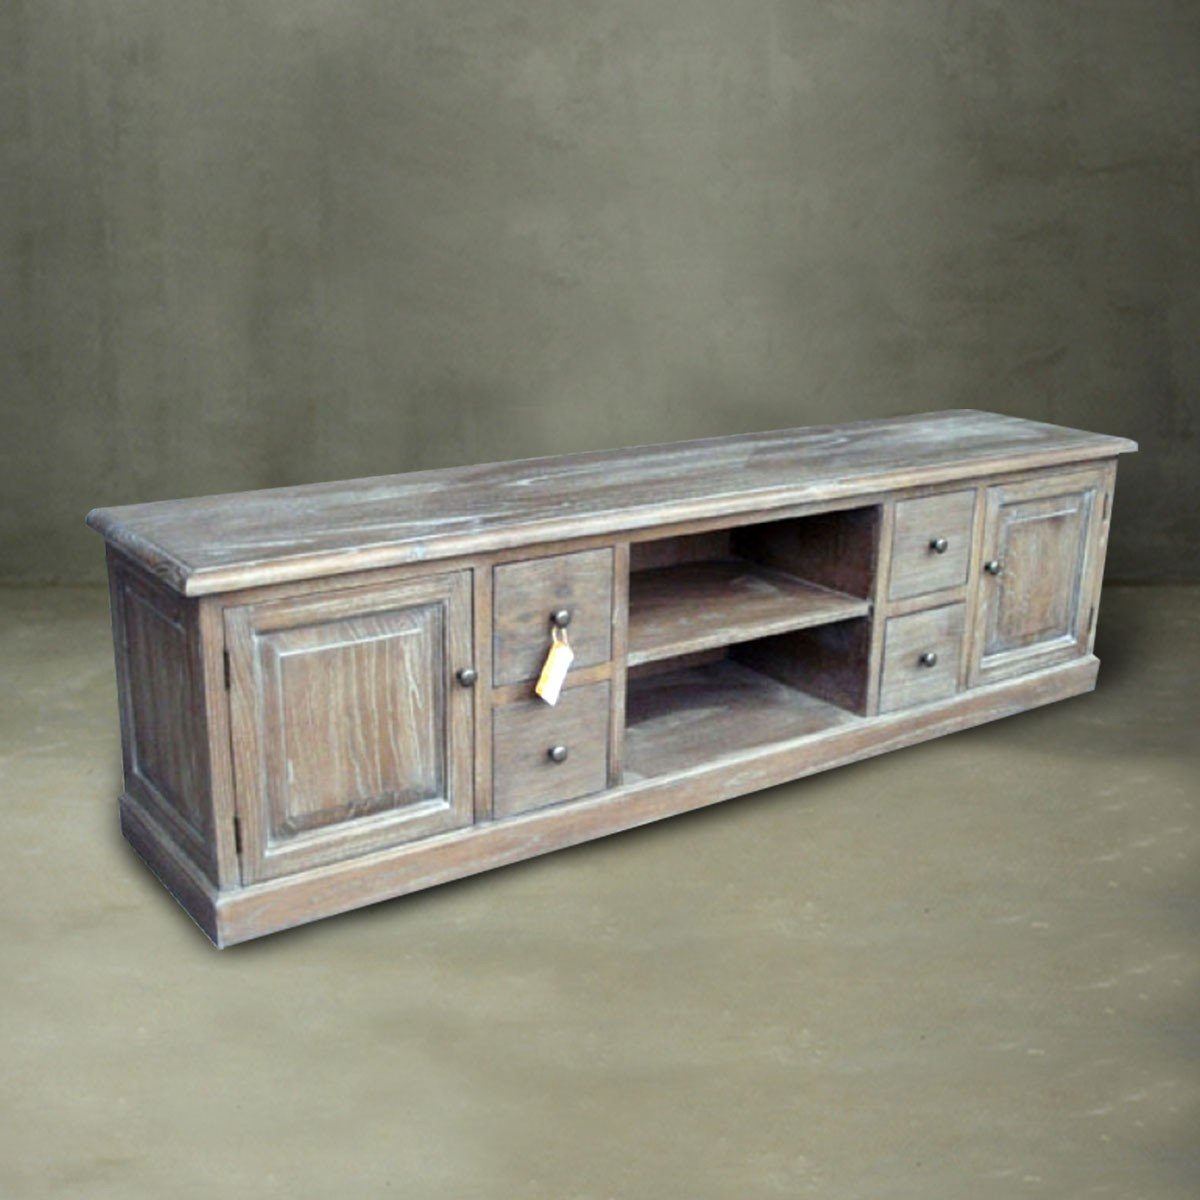 72 0 w meuble tv en bois massif pjg016 decoraport canada for Meuble tv canada